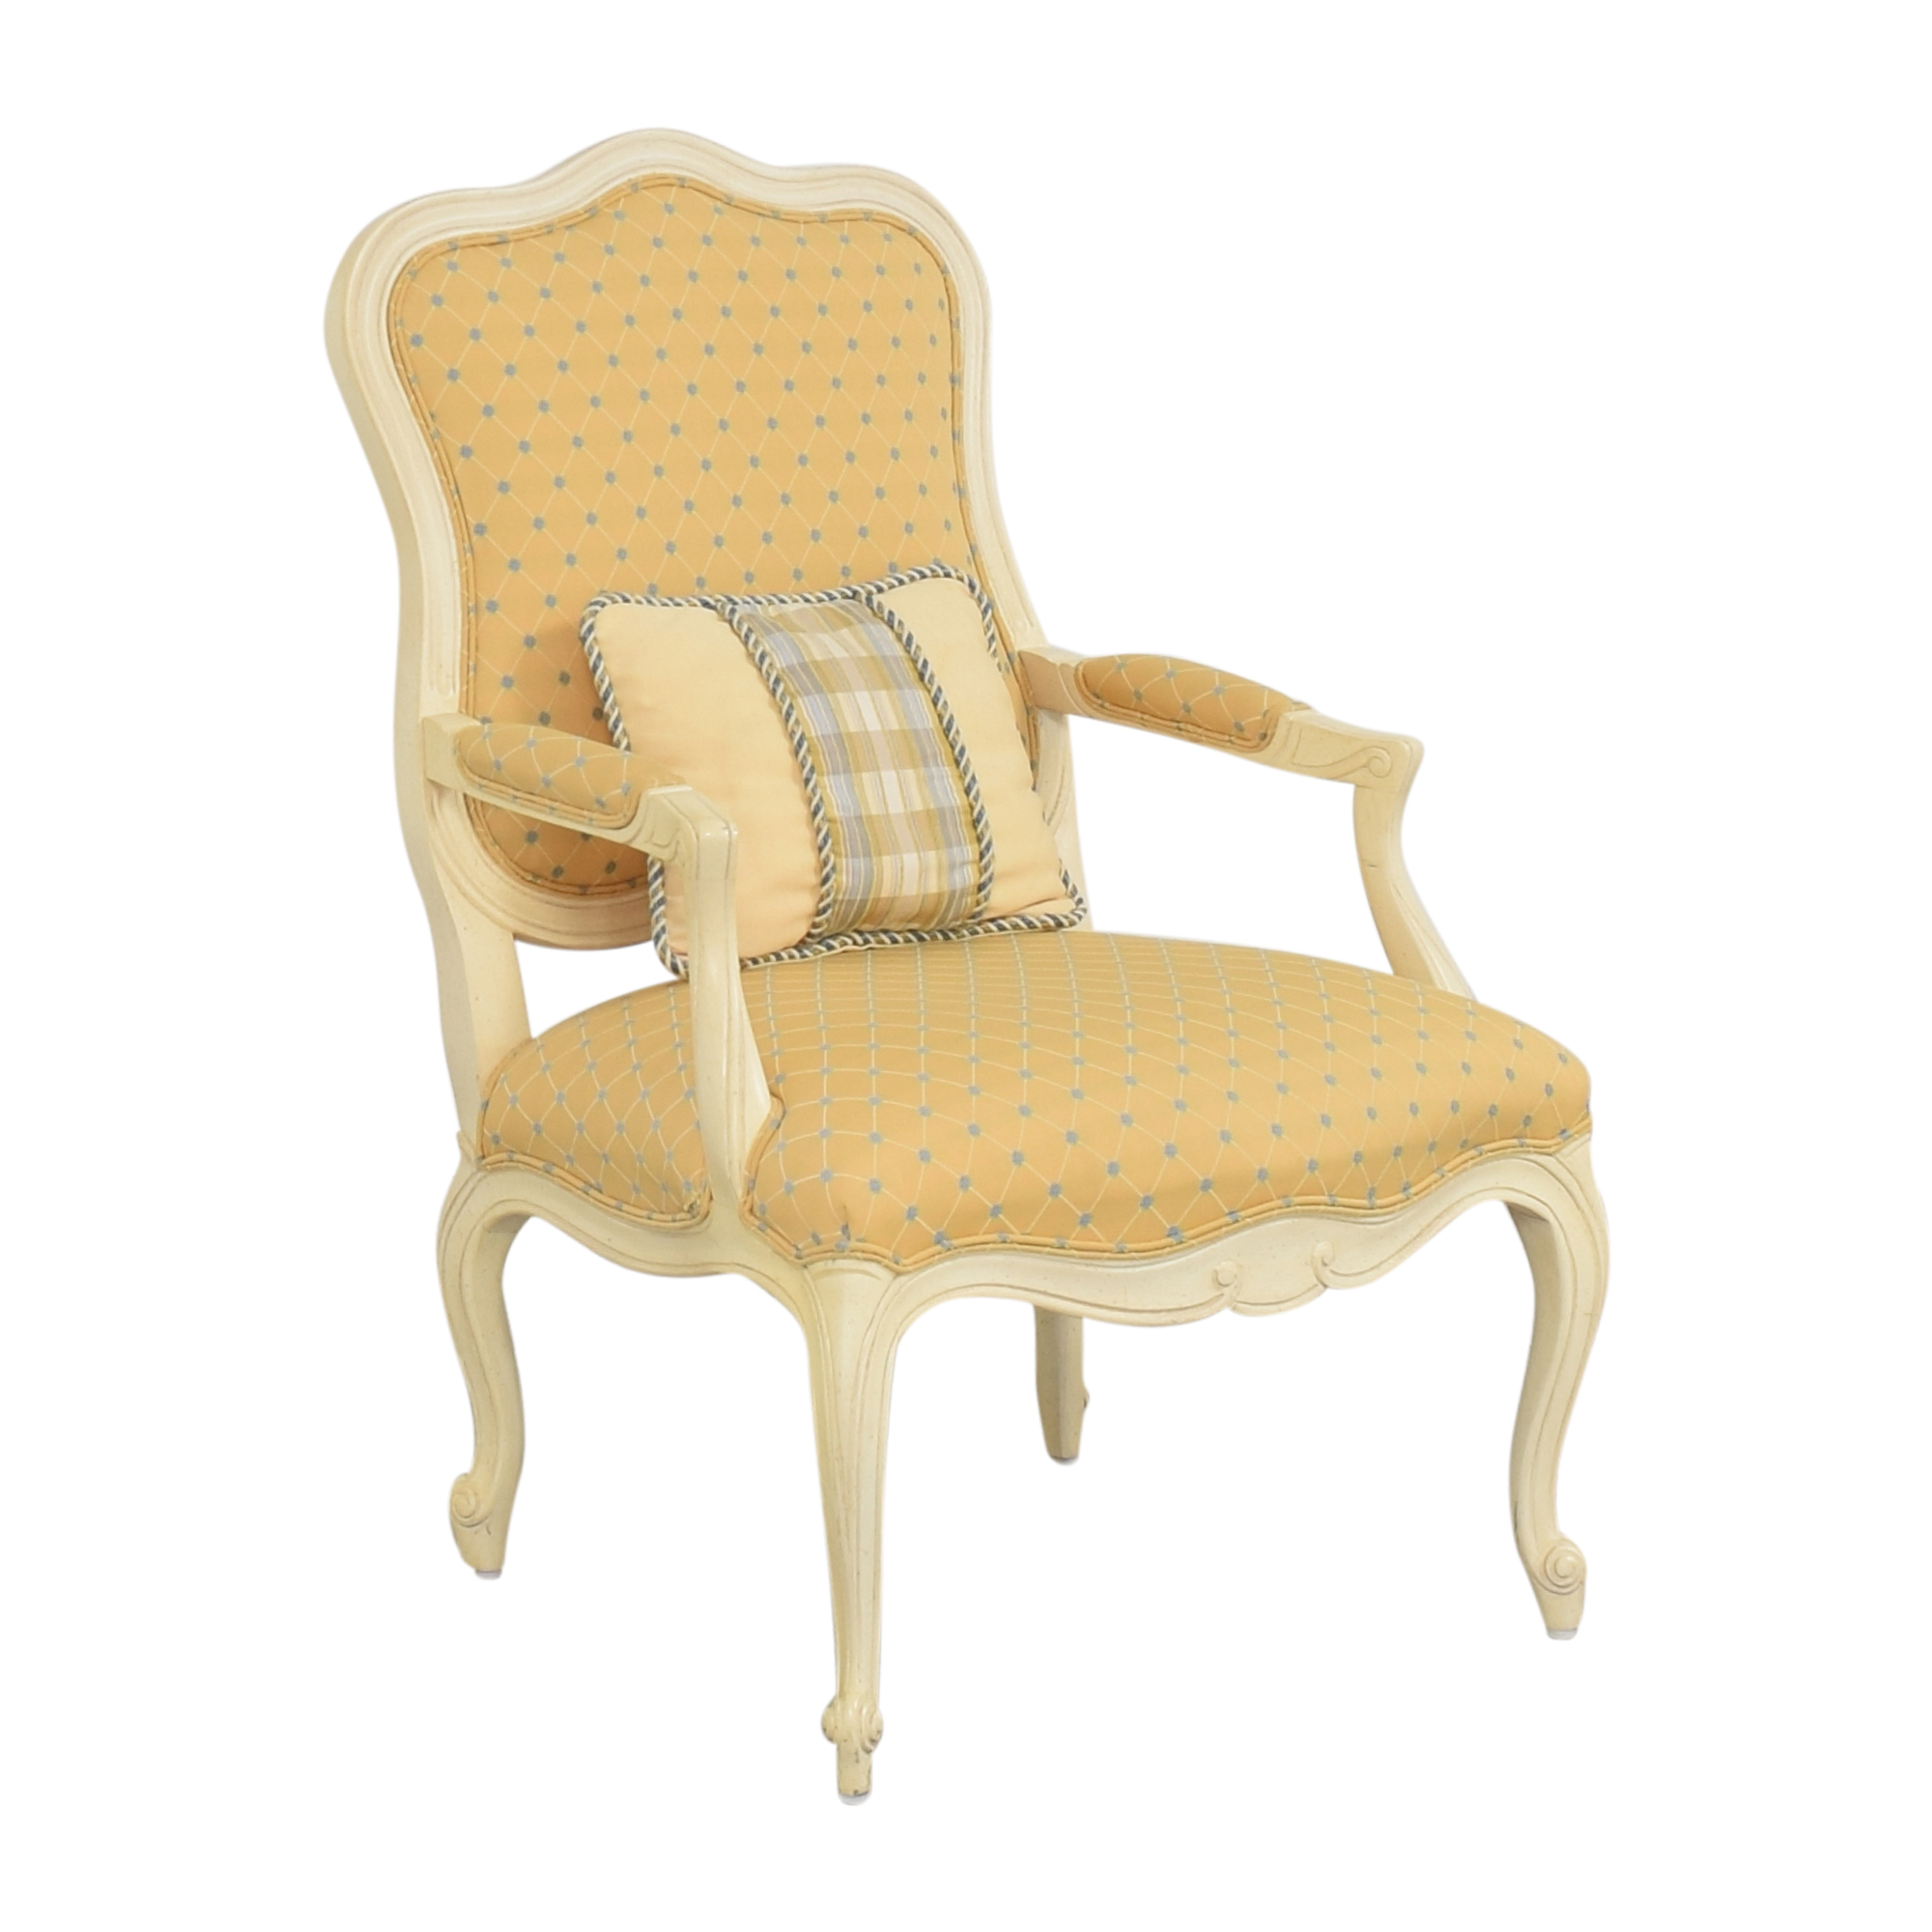 Ethan Allen Ethan Allen Chantel Chair used